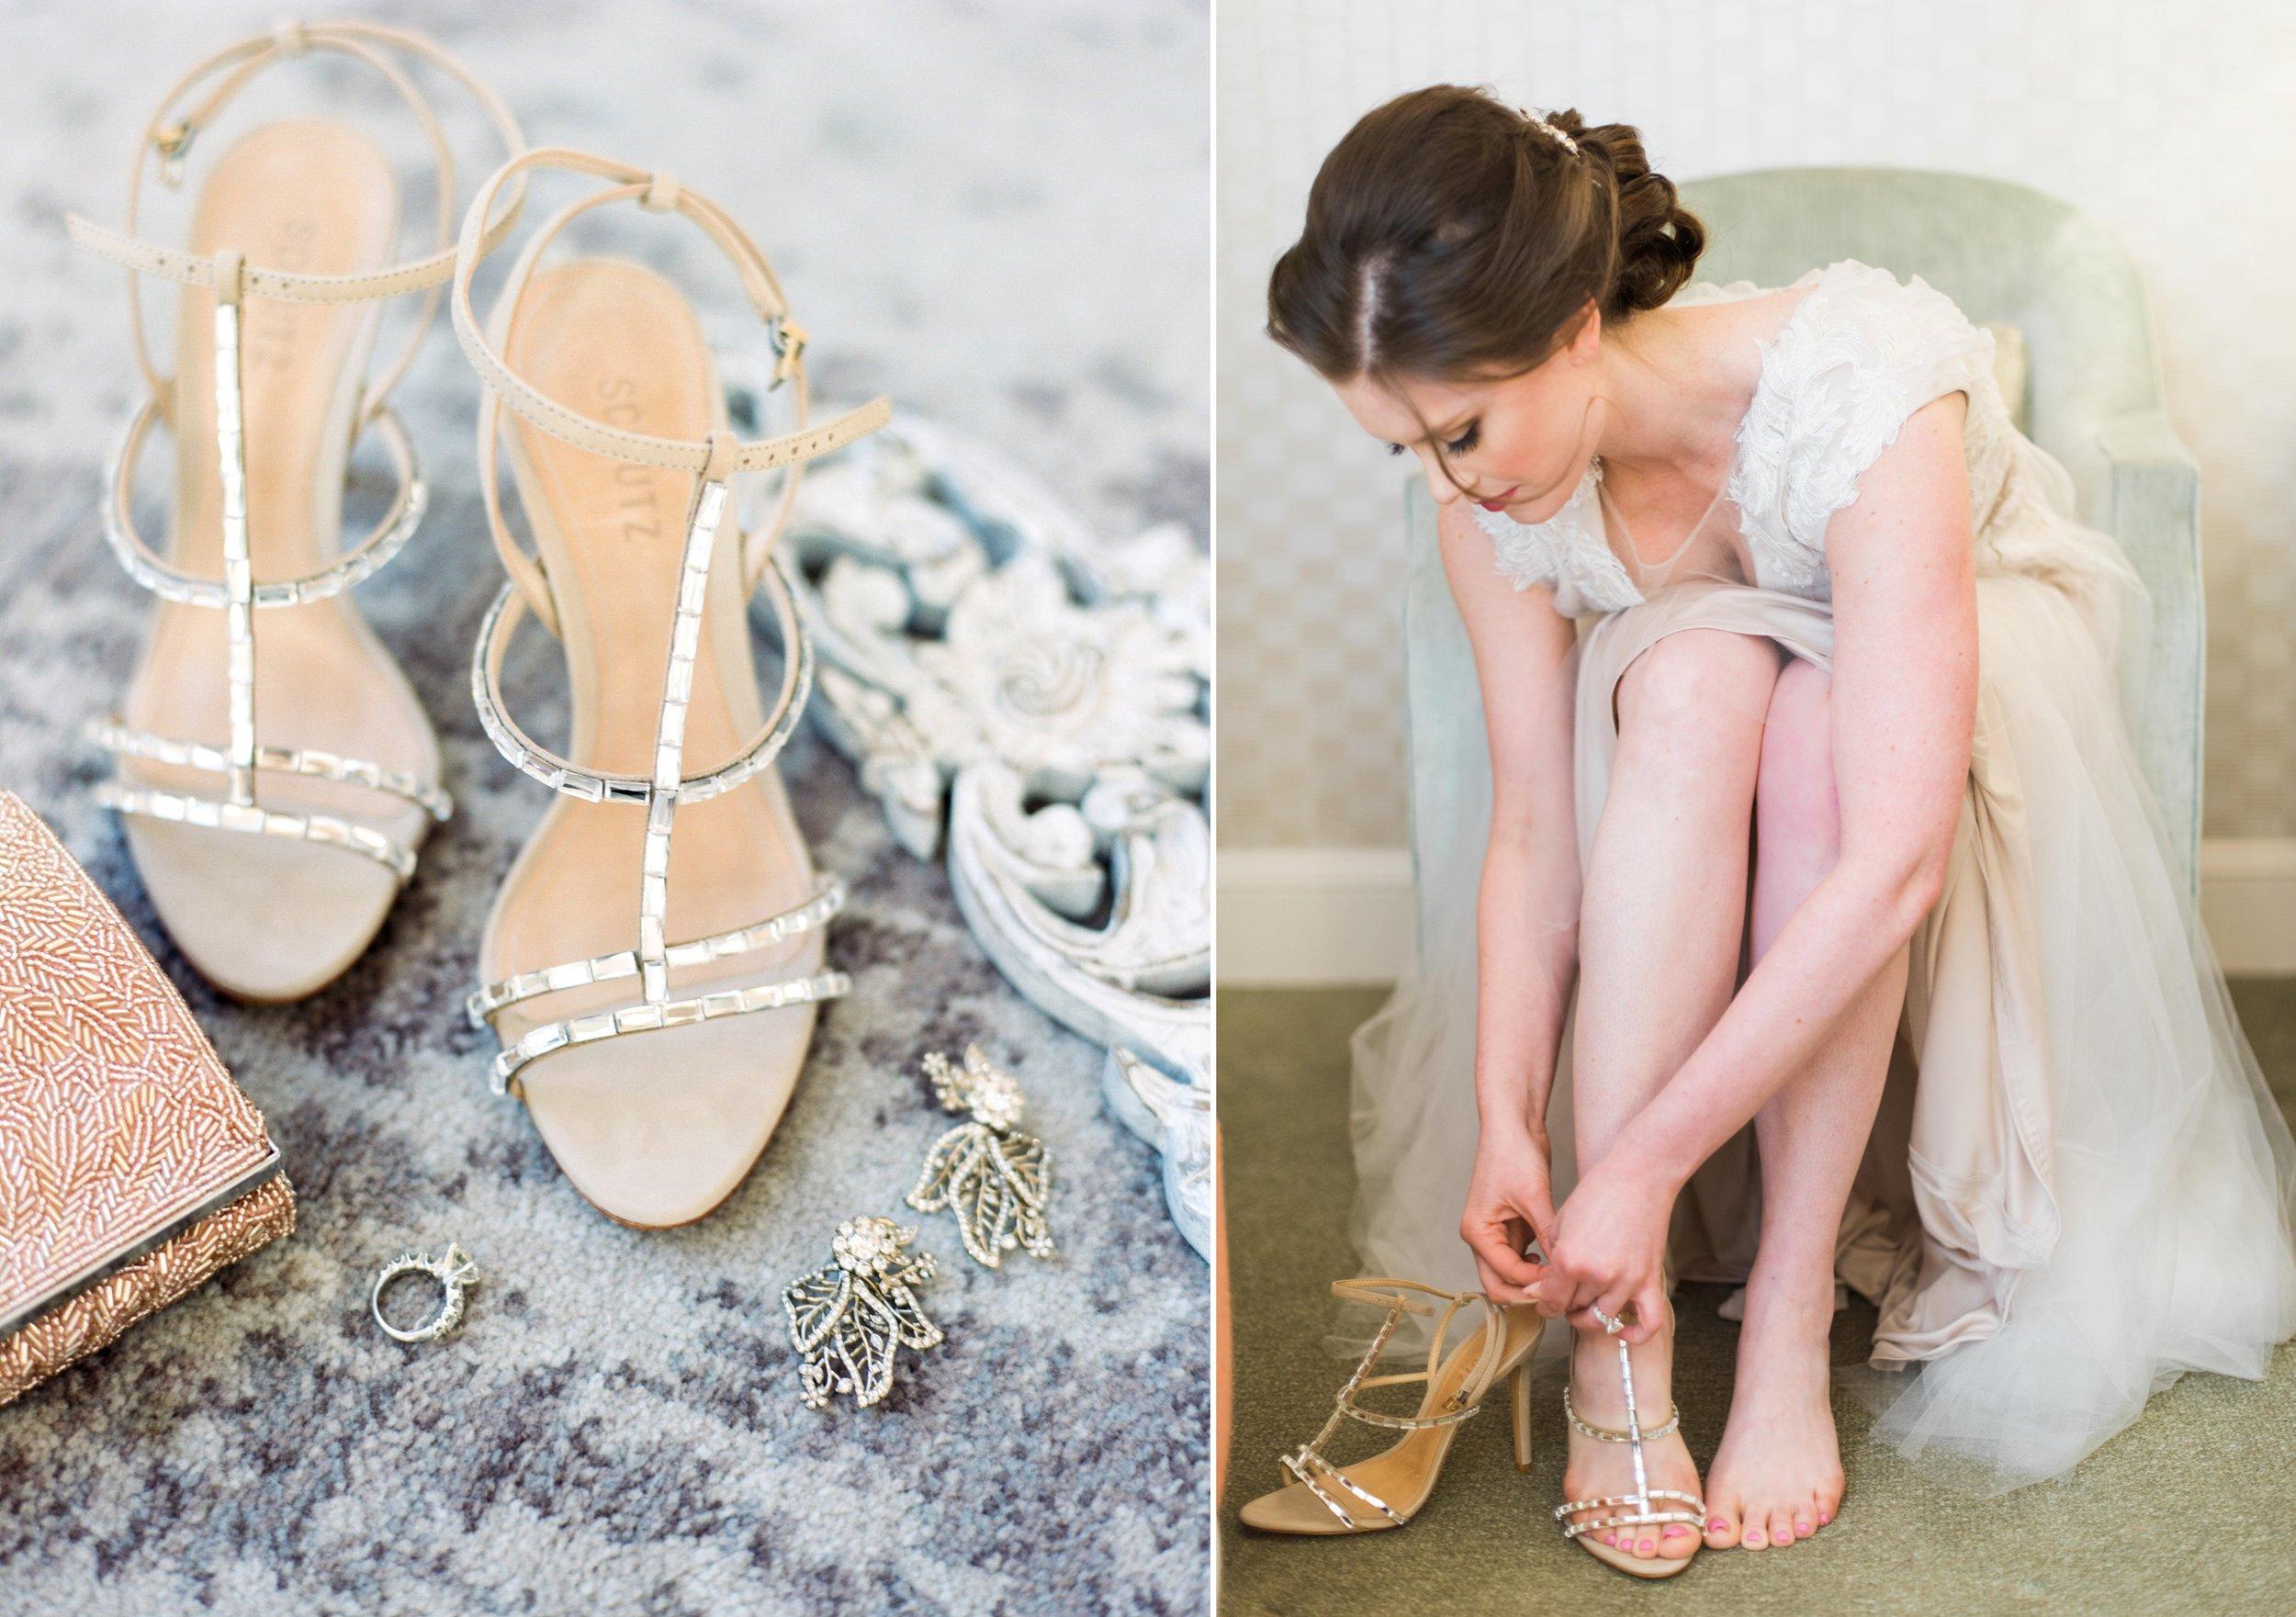 Houston-Wedding-Photographer-Lakeside-Country-Club-First-Look-Bride-Groom-Formals-Film-Fine-Art-Photography-204.jpg